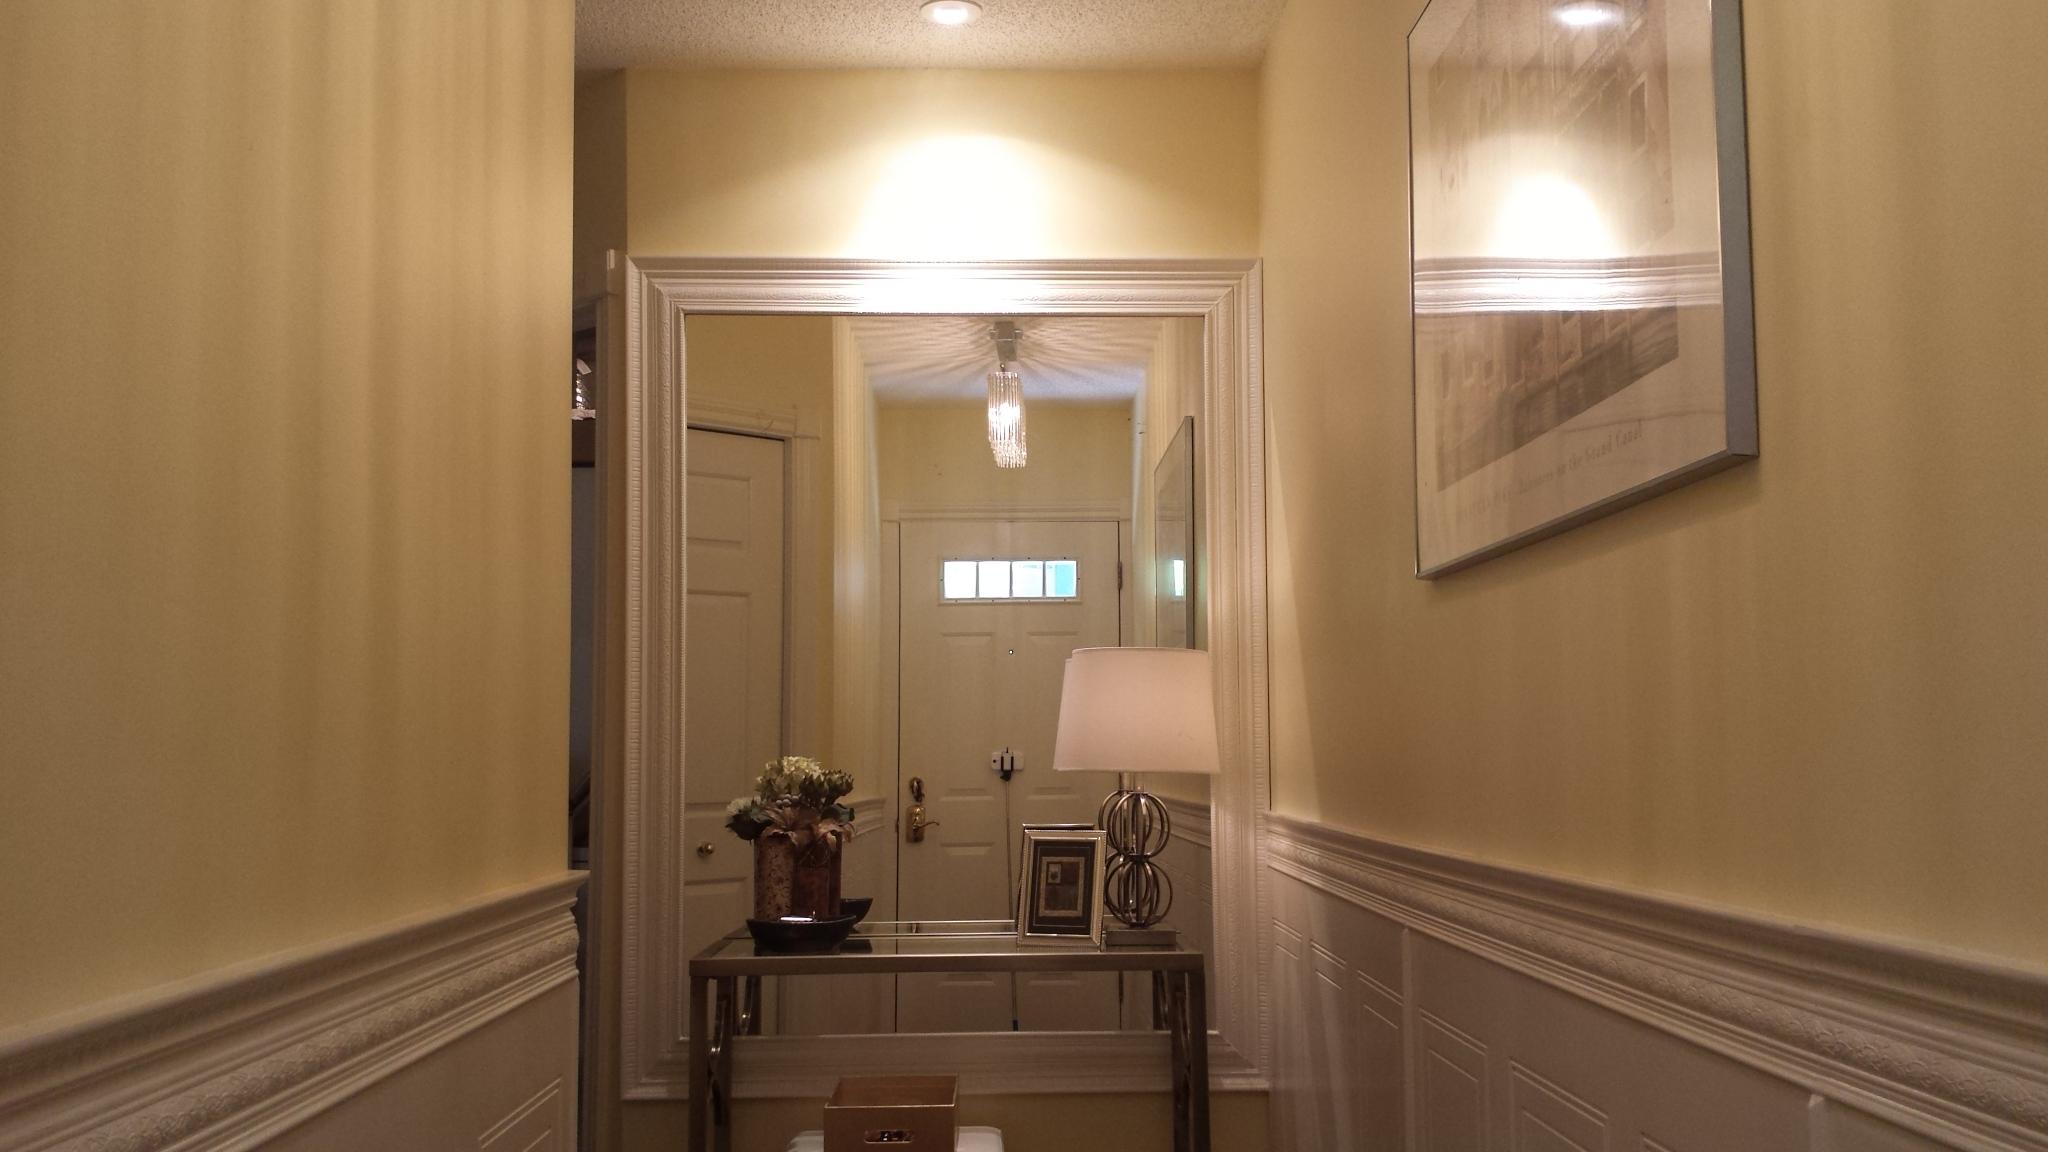 Unit 204 - Hallway 2